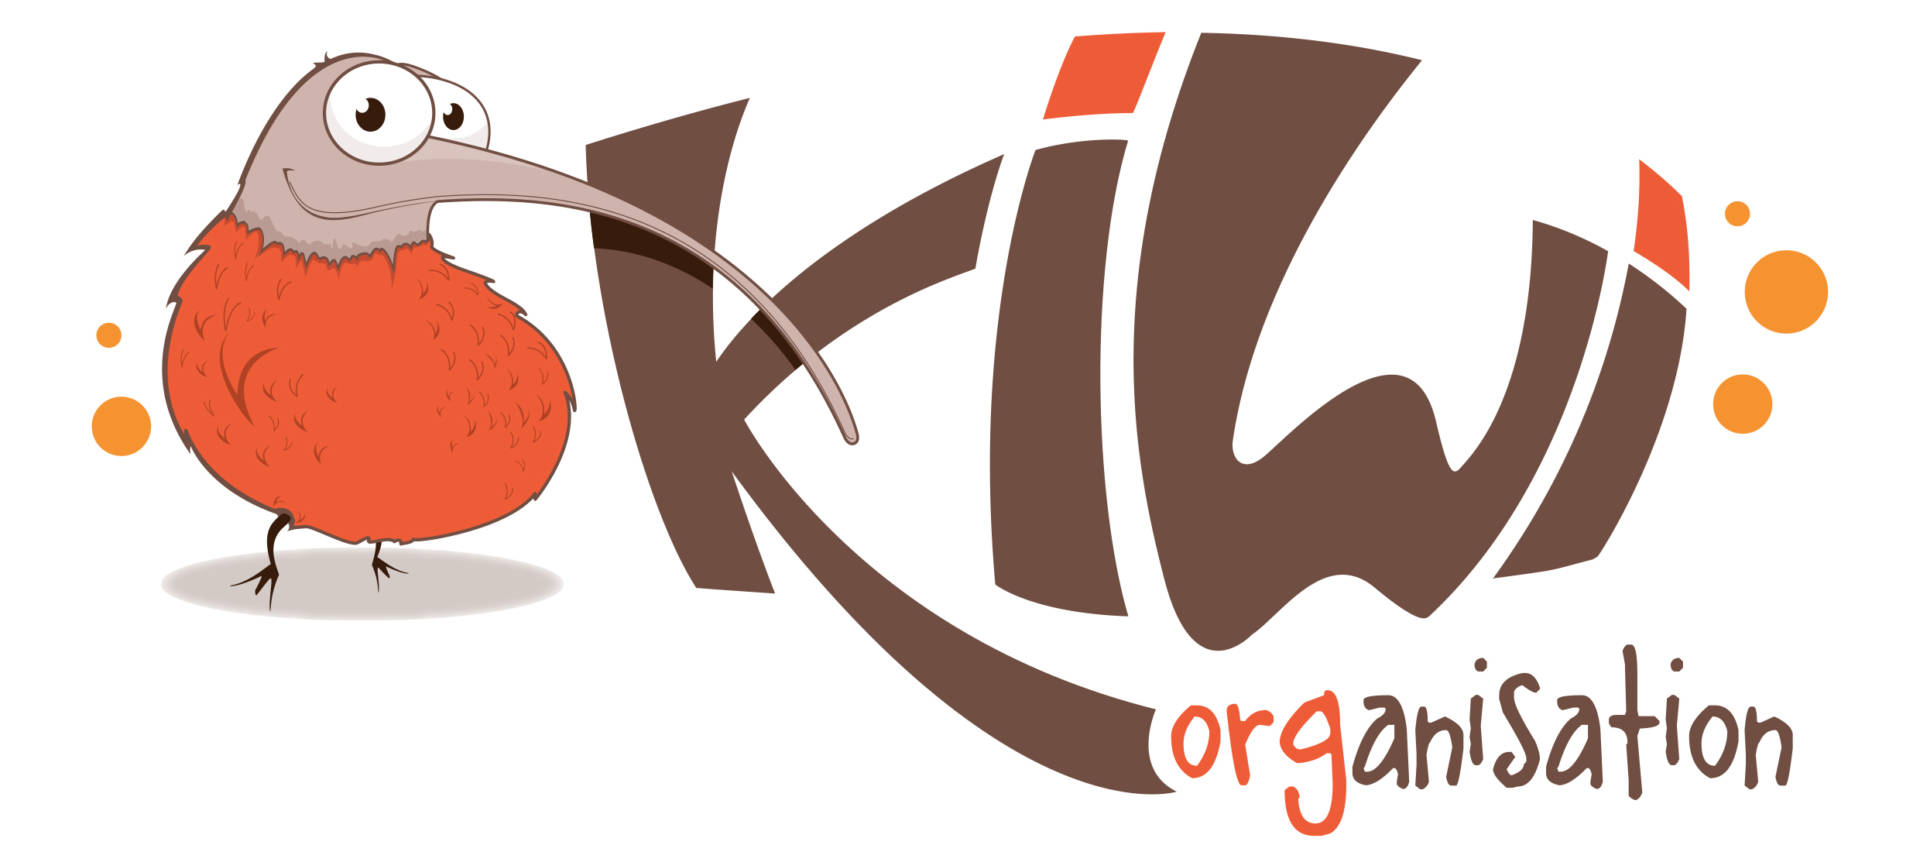 Kiwi Organisation